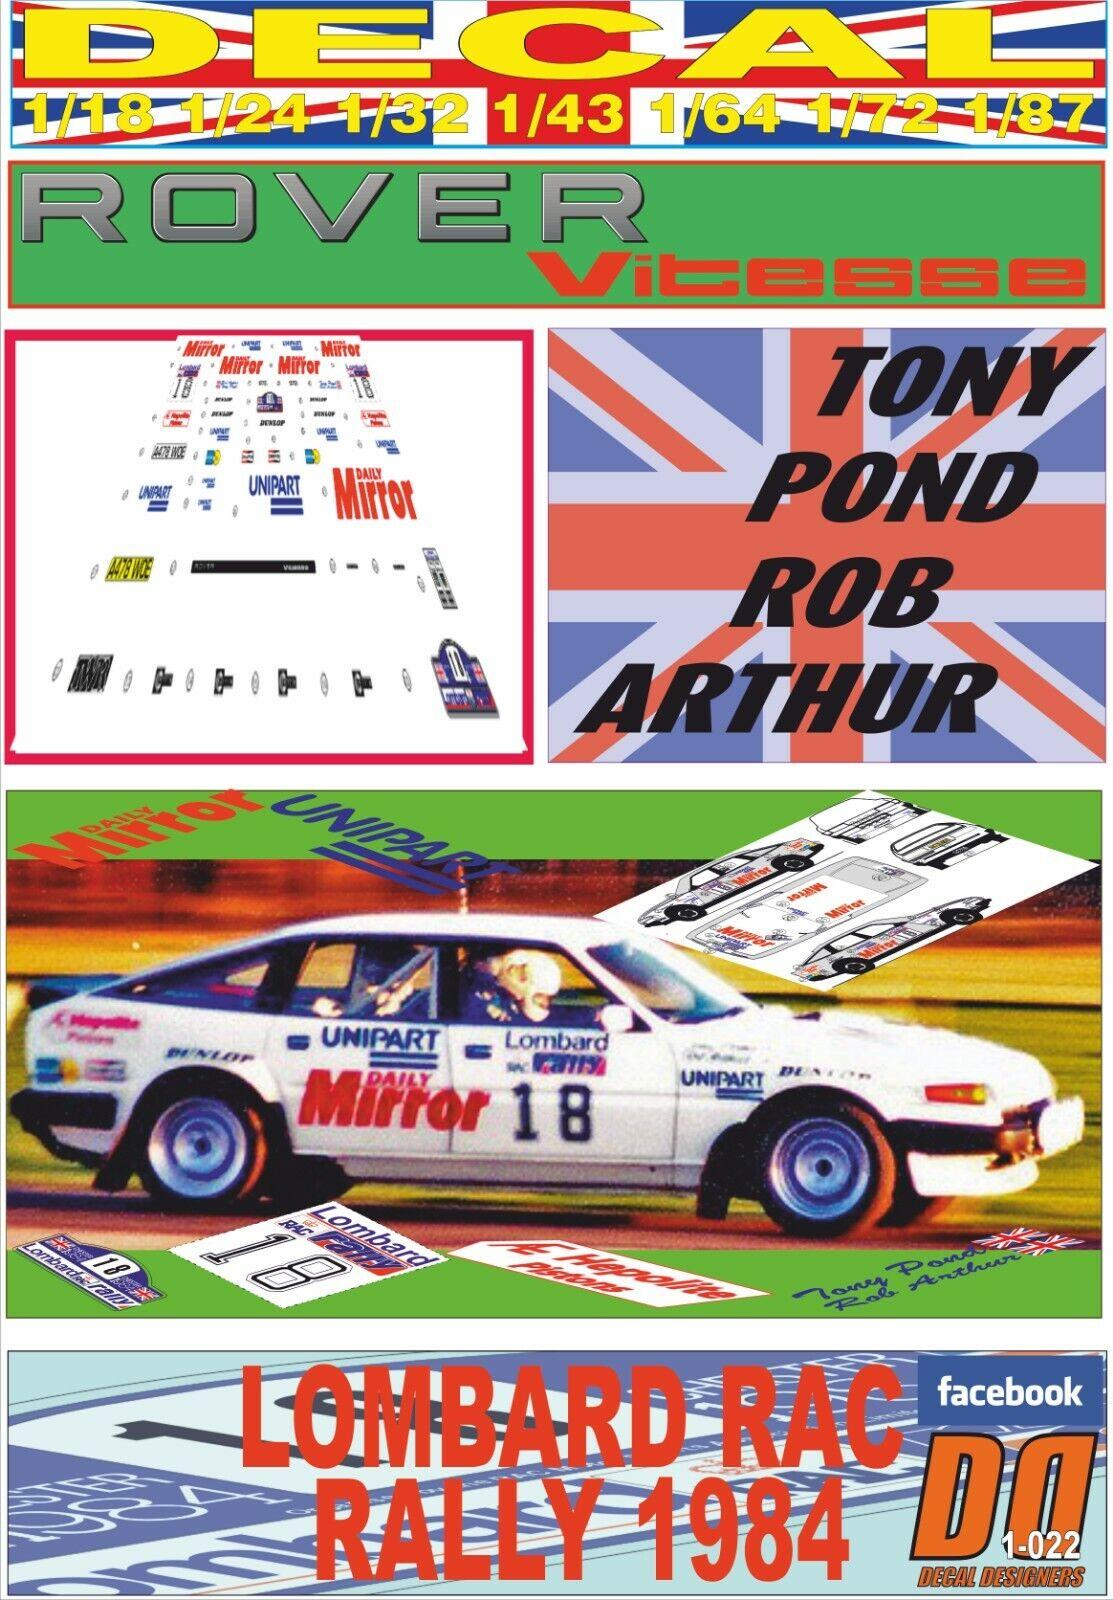 DECAL ROVER SD1 VITESSE TONI POND RAC rally 1984 DnF (08)